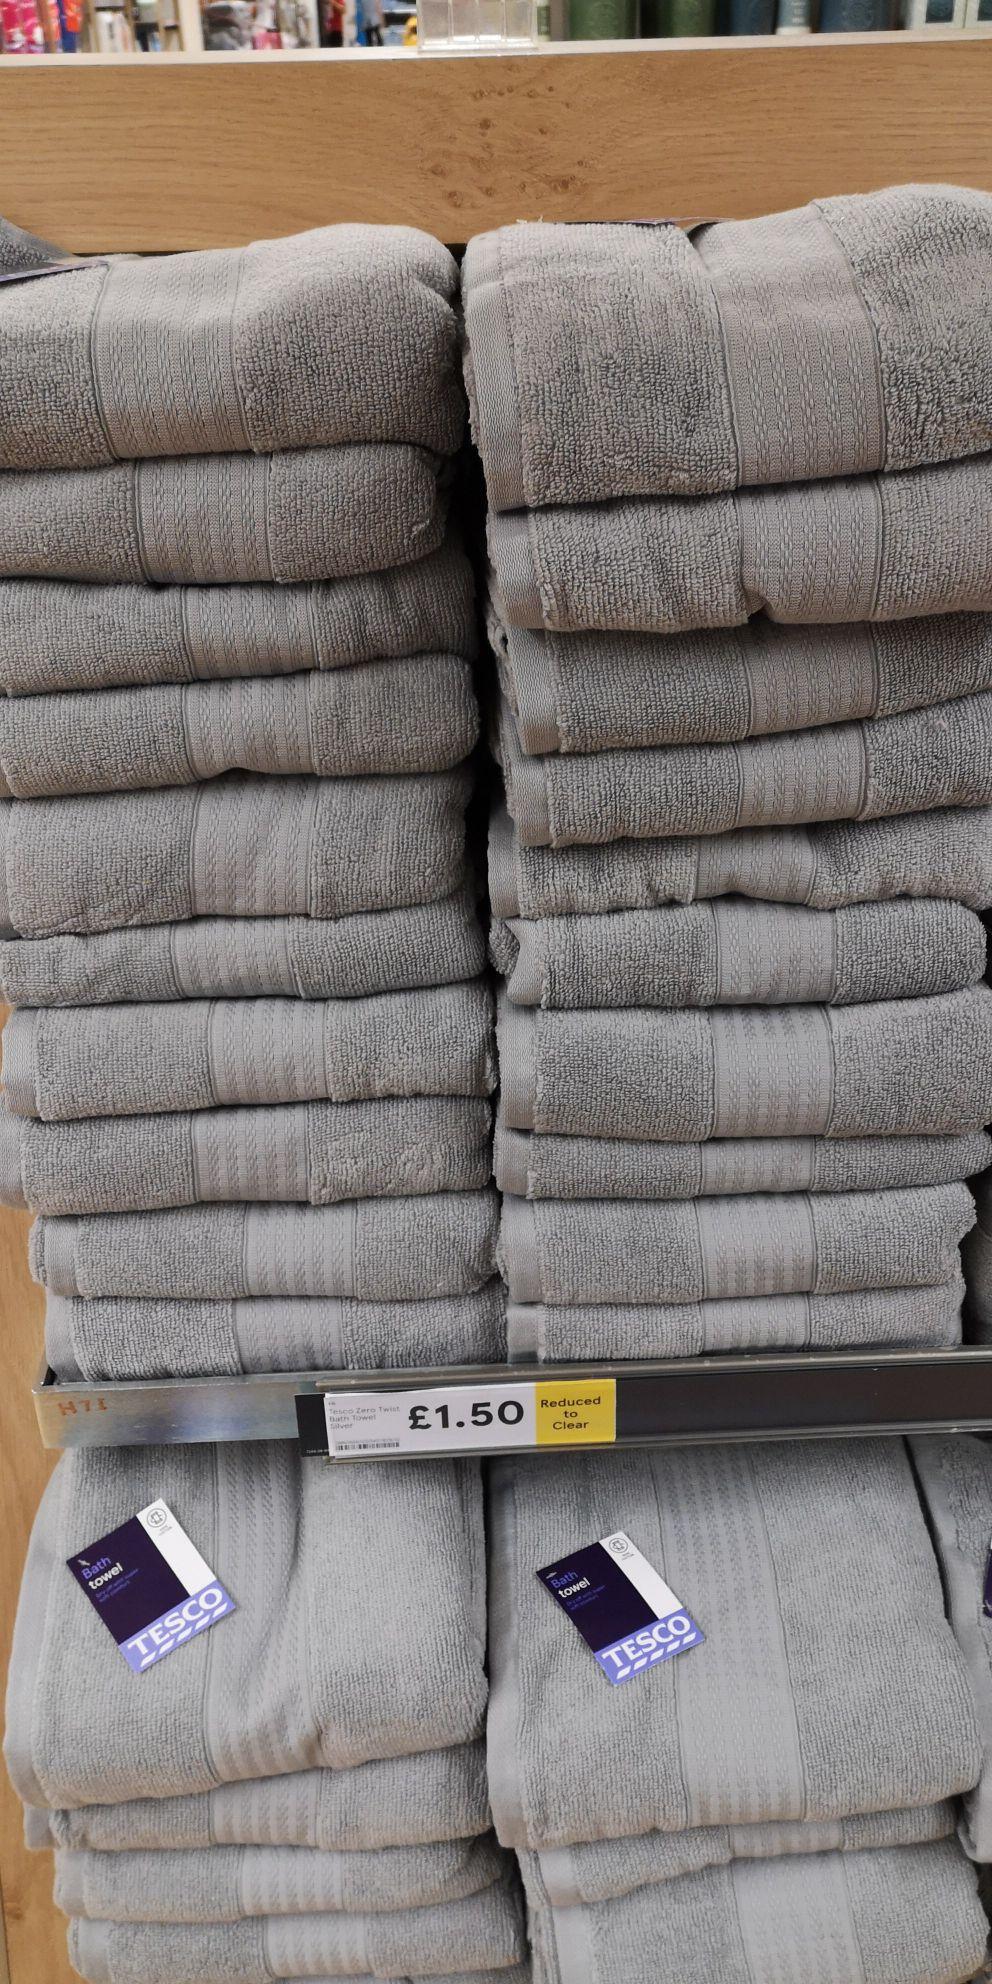 Tesco zero twist towels. Bath sheet £.2.50, bath towel £1.50 and hand towel £1 @ tesco